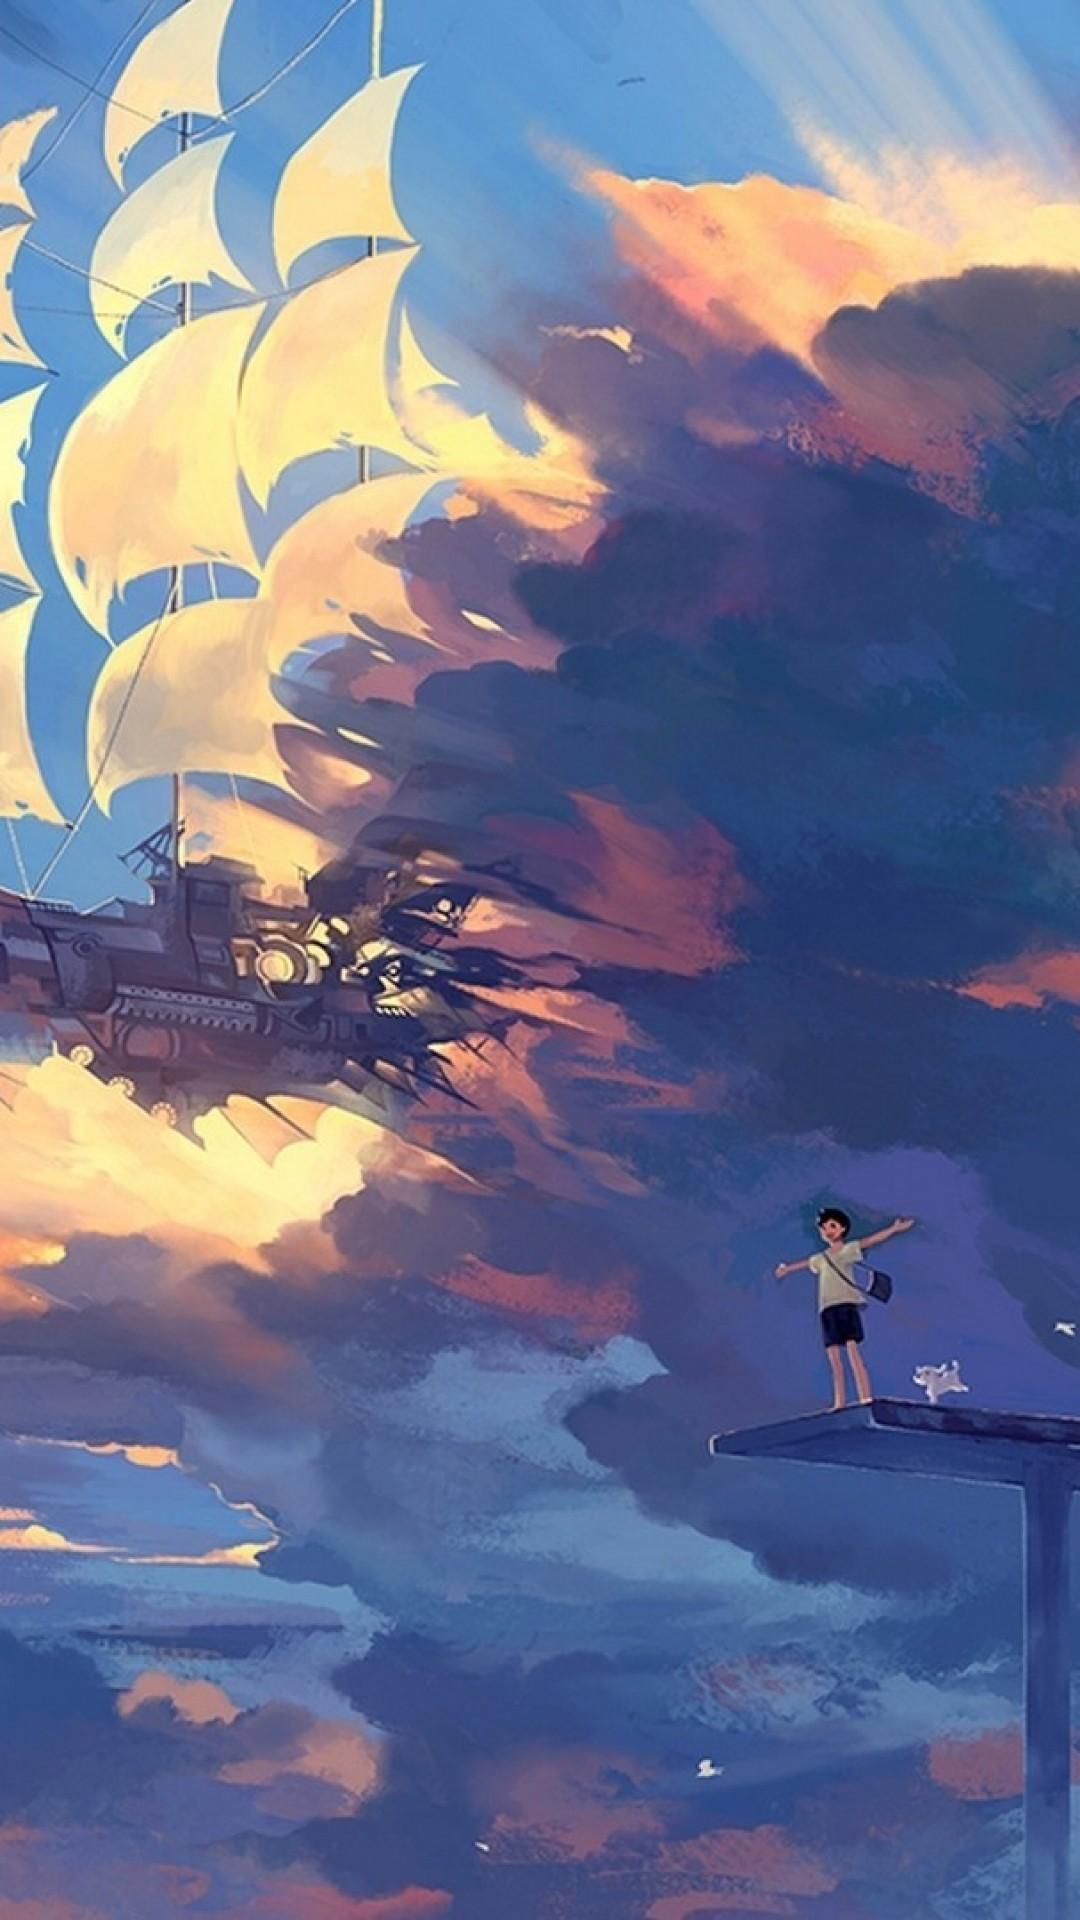 Wallpaper hanyijie, sky, scenery, ship, anime, art